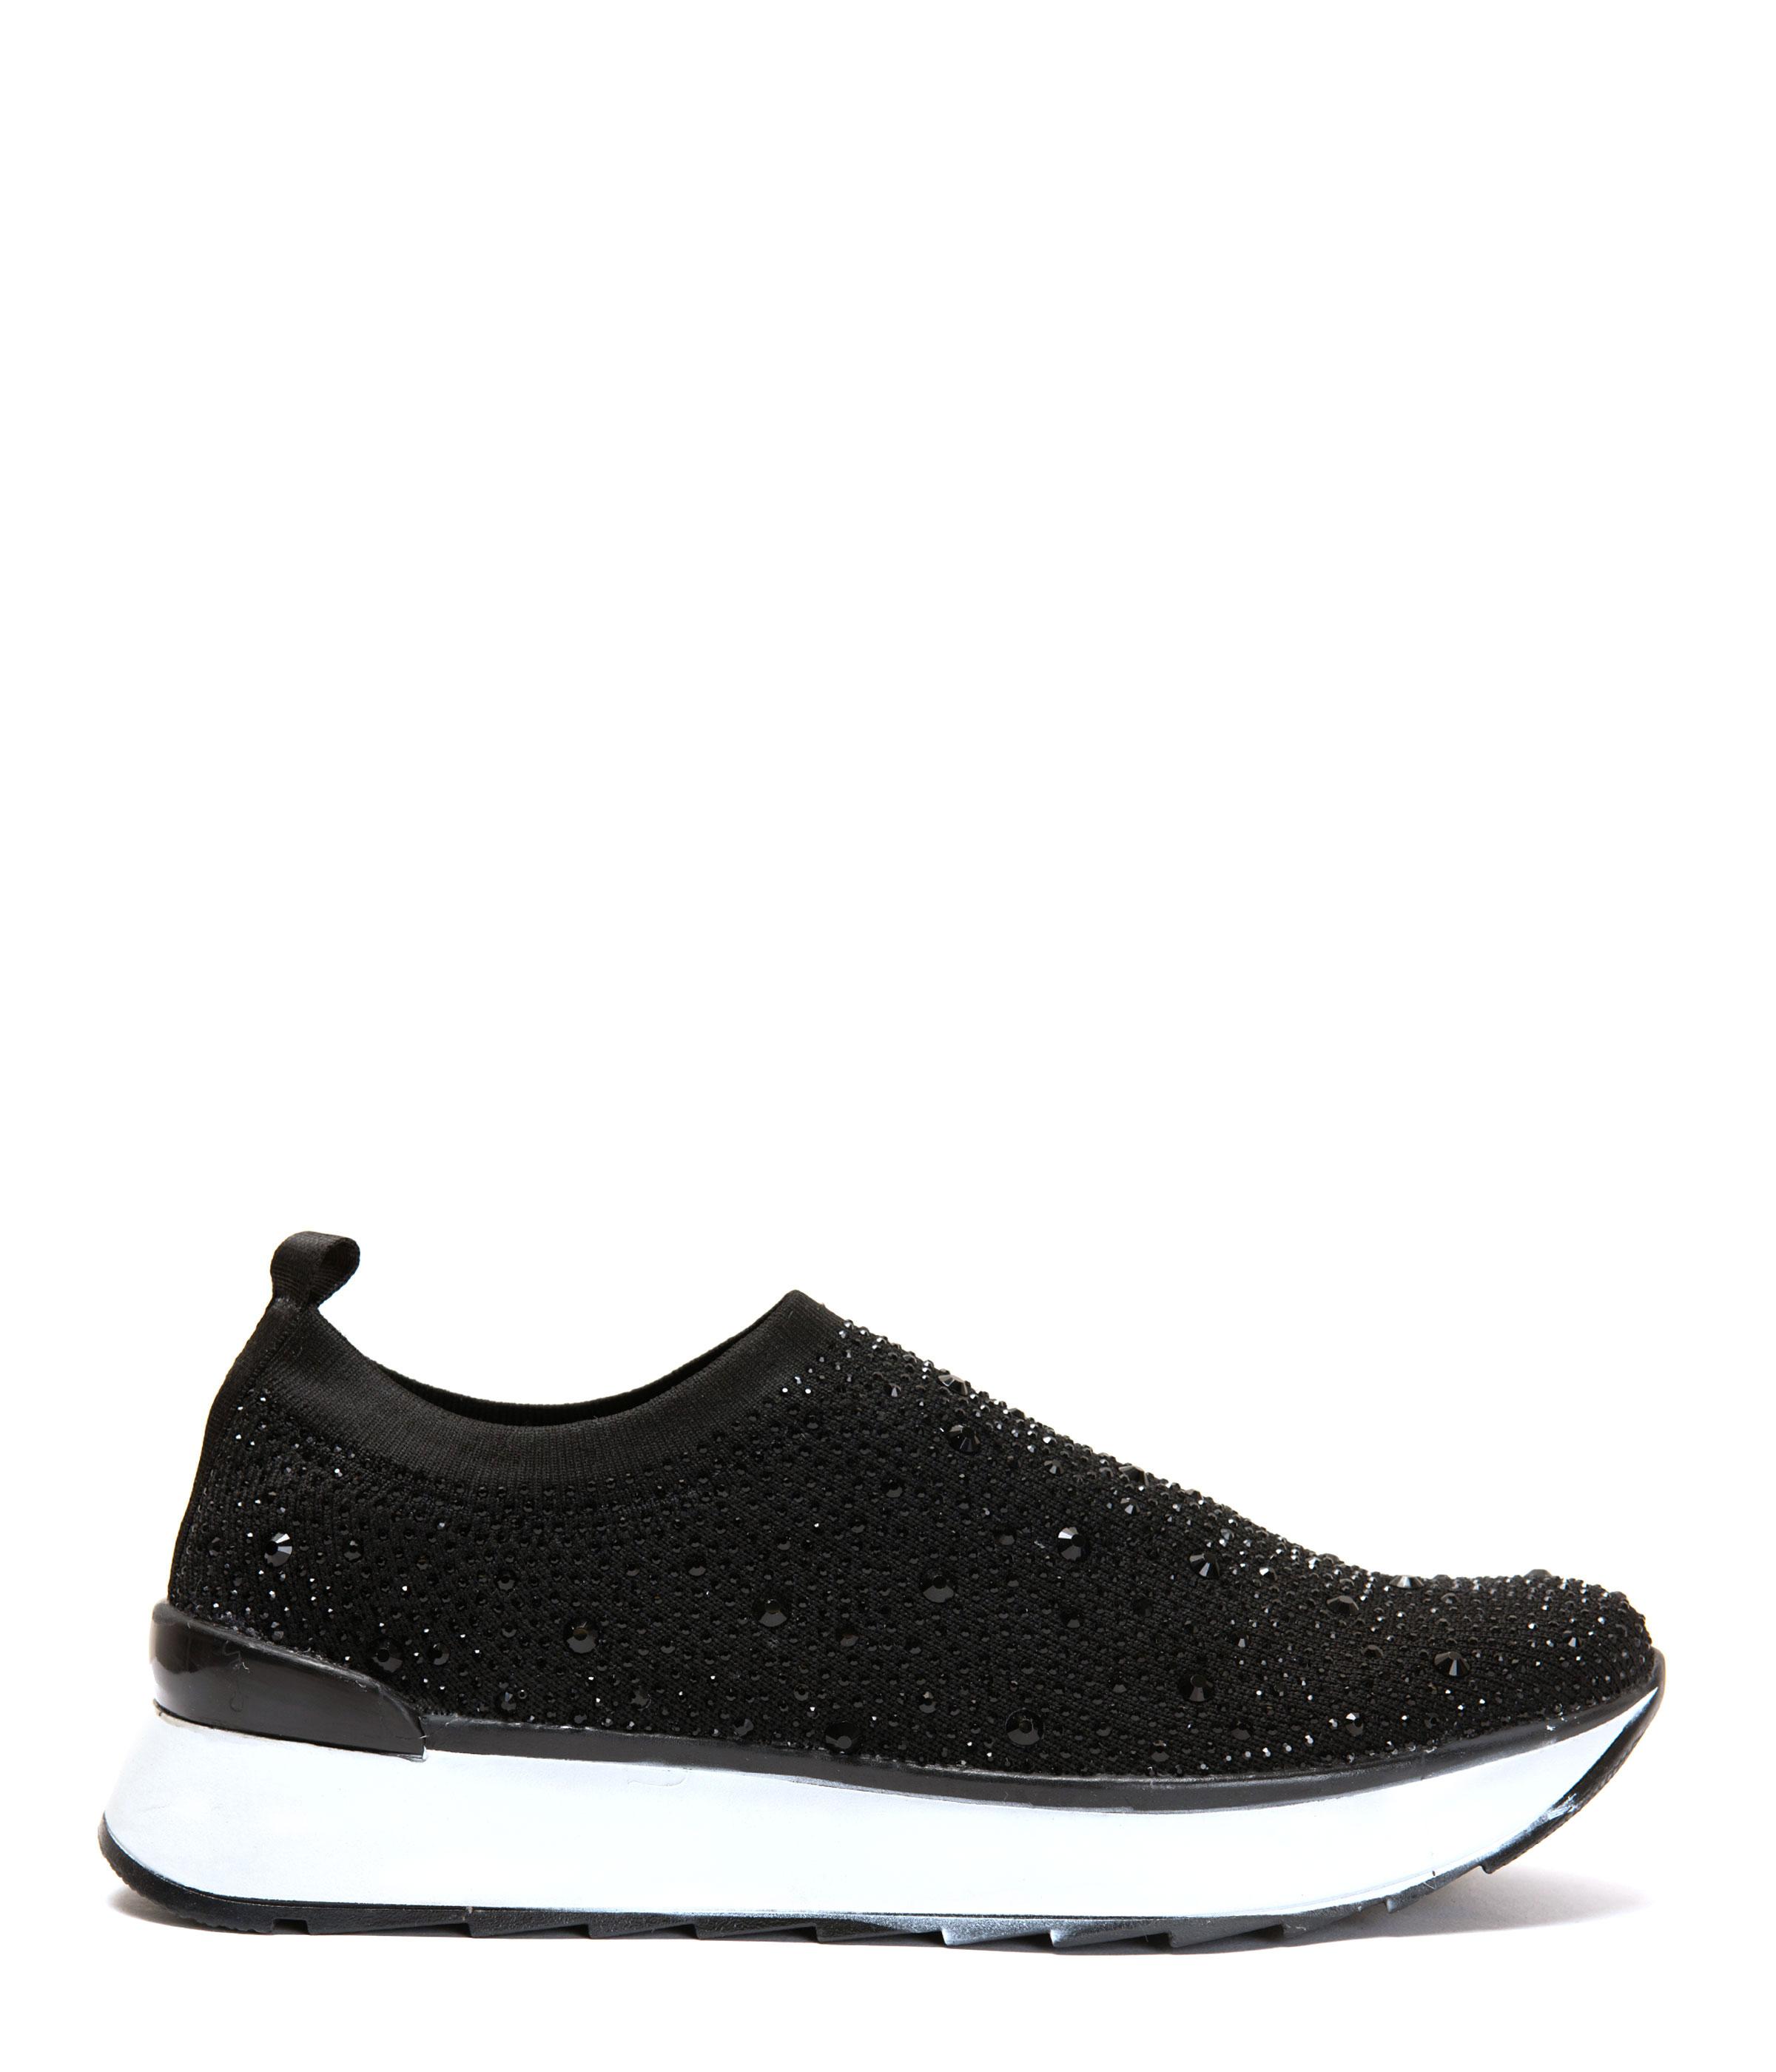 Exe Μαύρα Sneakers FIORELLA-115 - Glami.gr 30bbb6d90b6